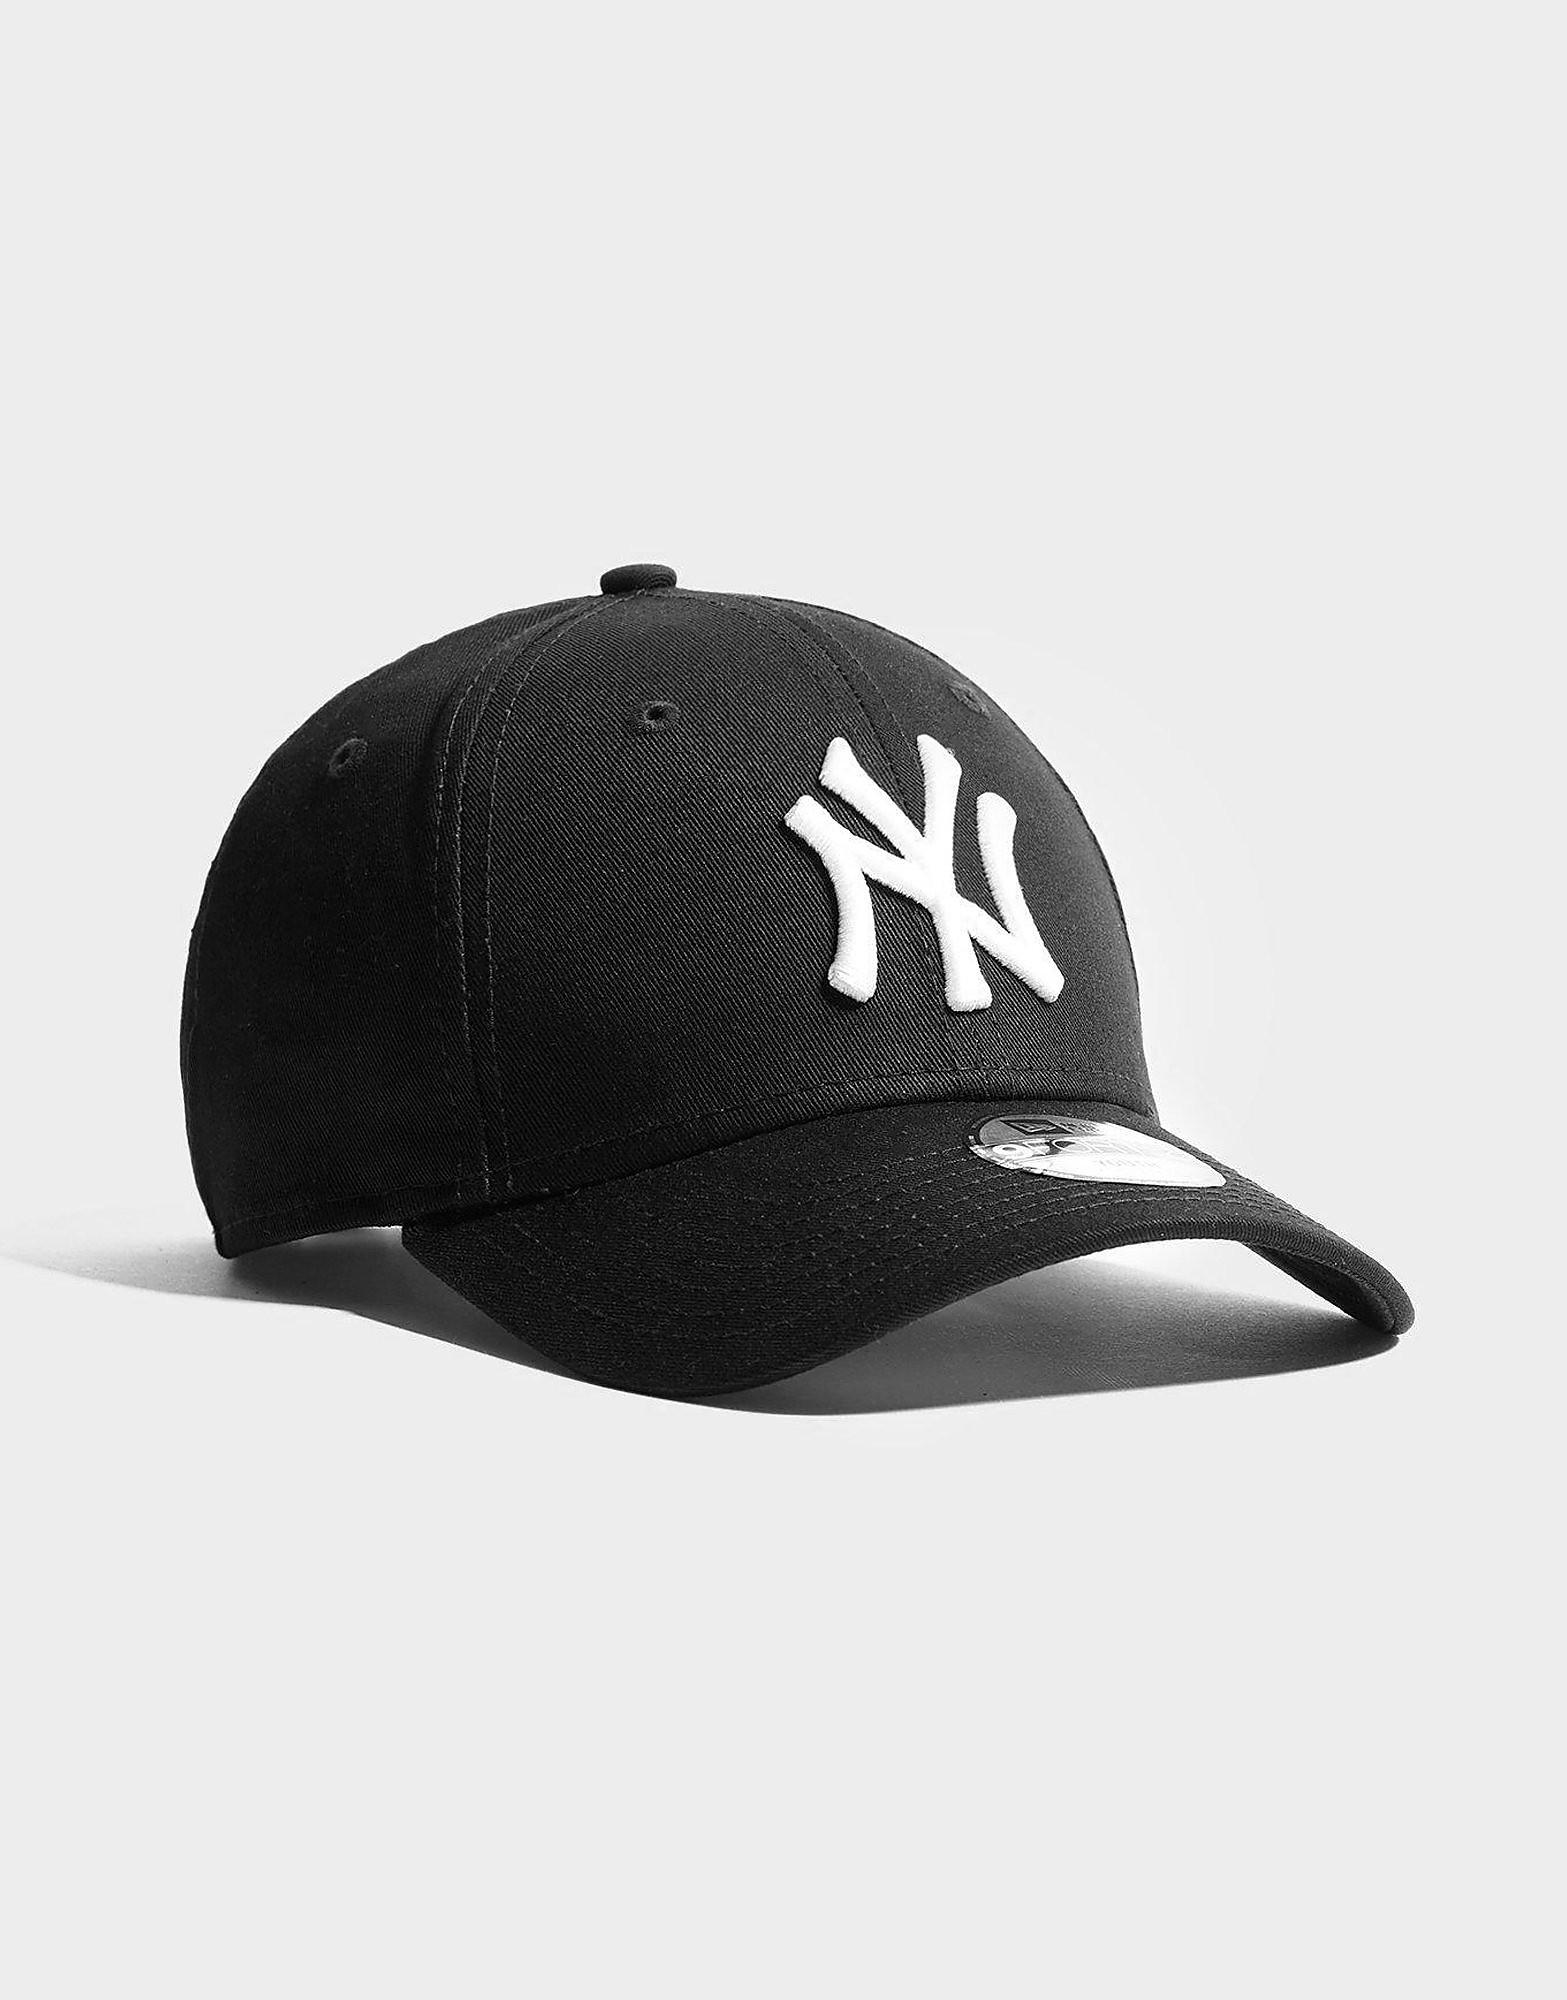 New Era 9FORTY MLB New York Yankees-juniorkasket